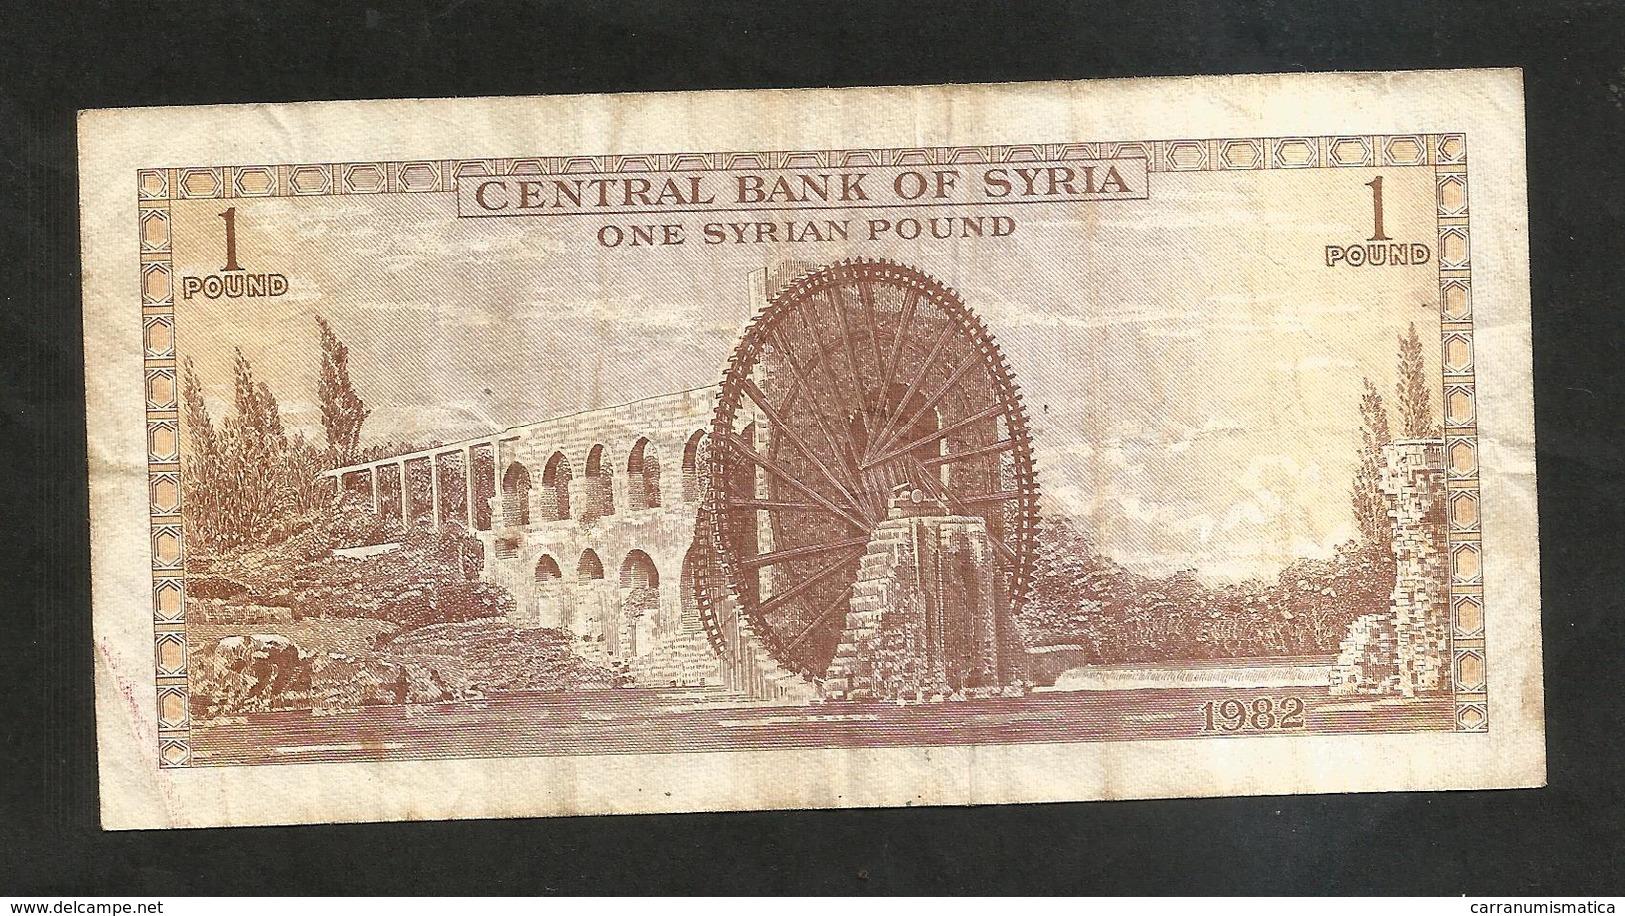 SIRIA - Central Bank Of SYRIA - 1 POUND (1982) - Syrie